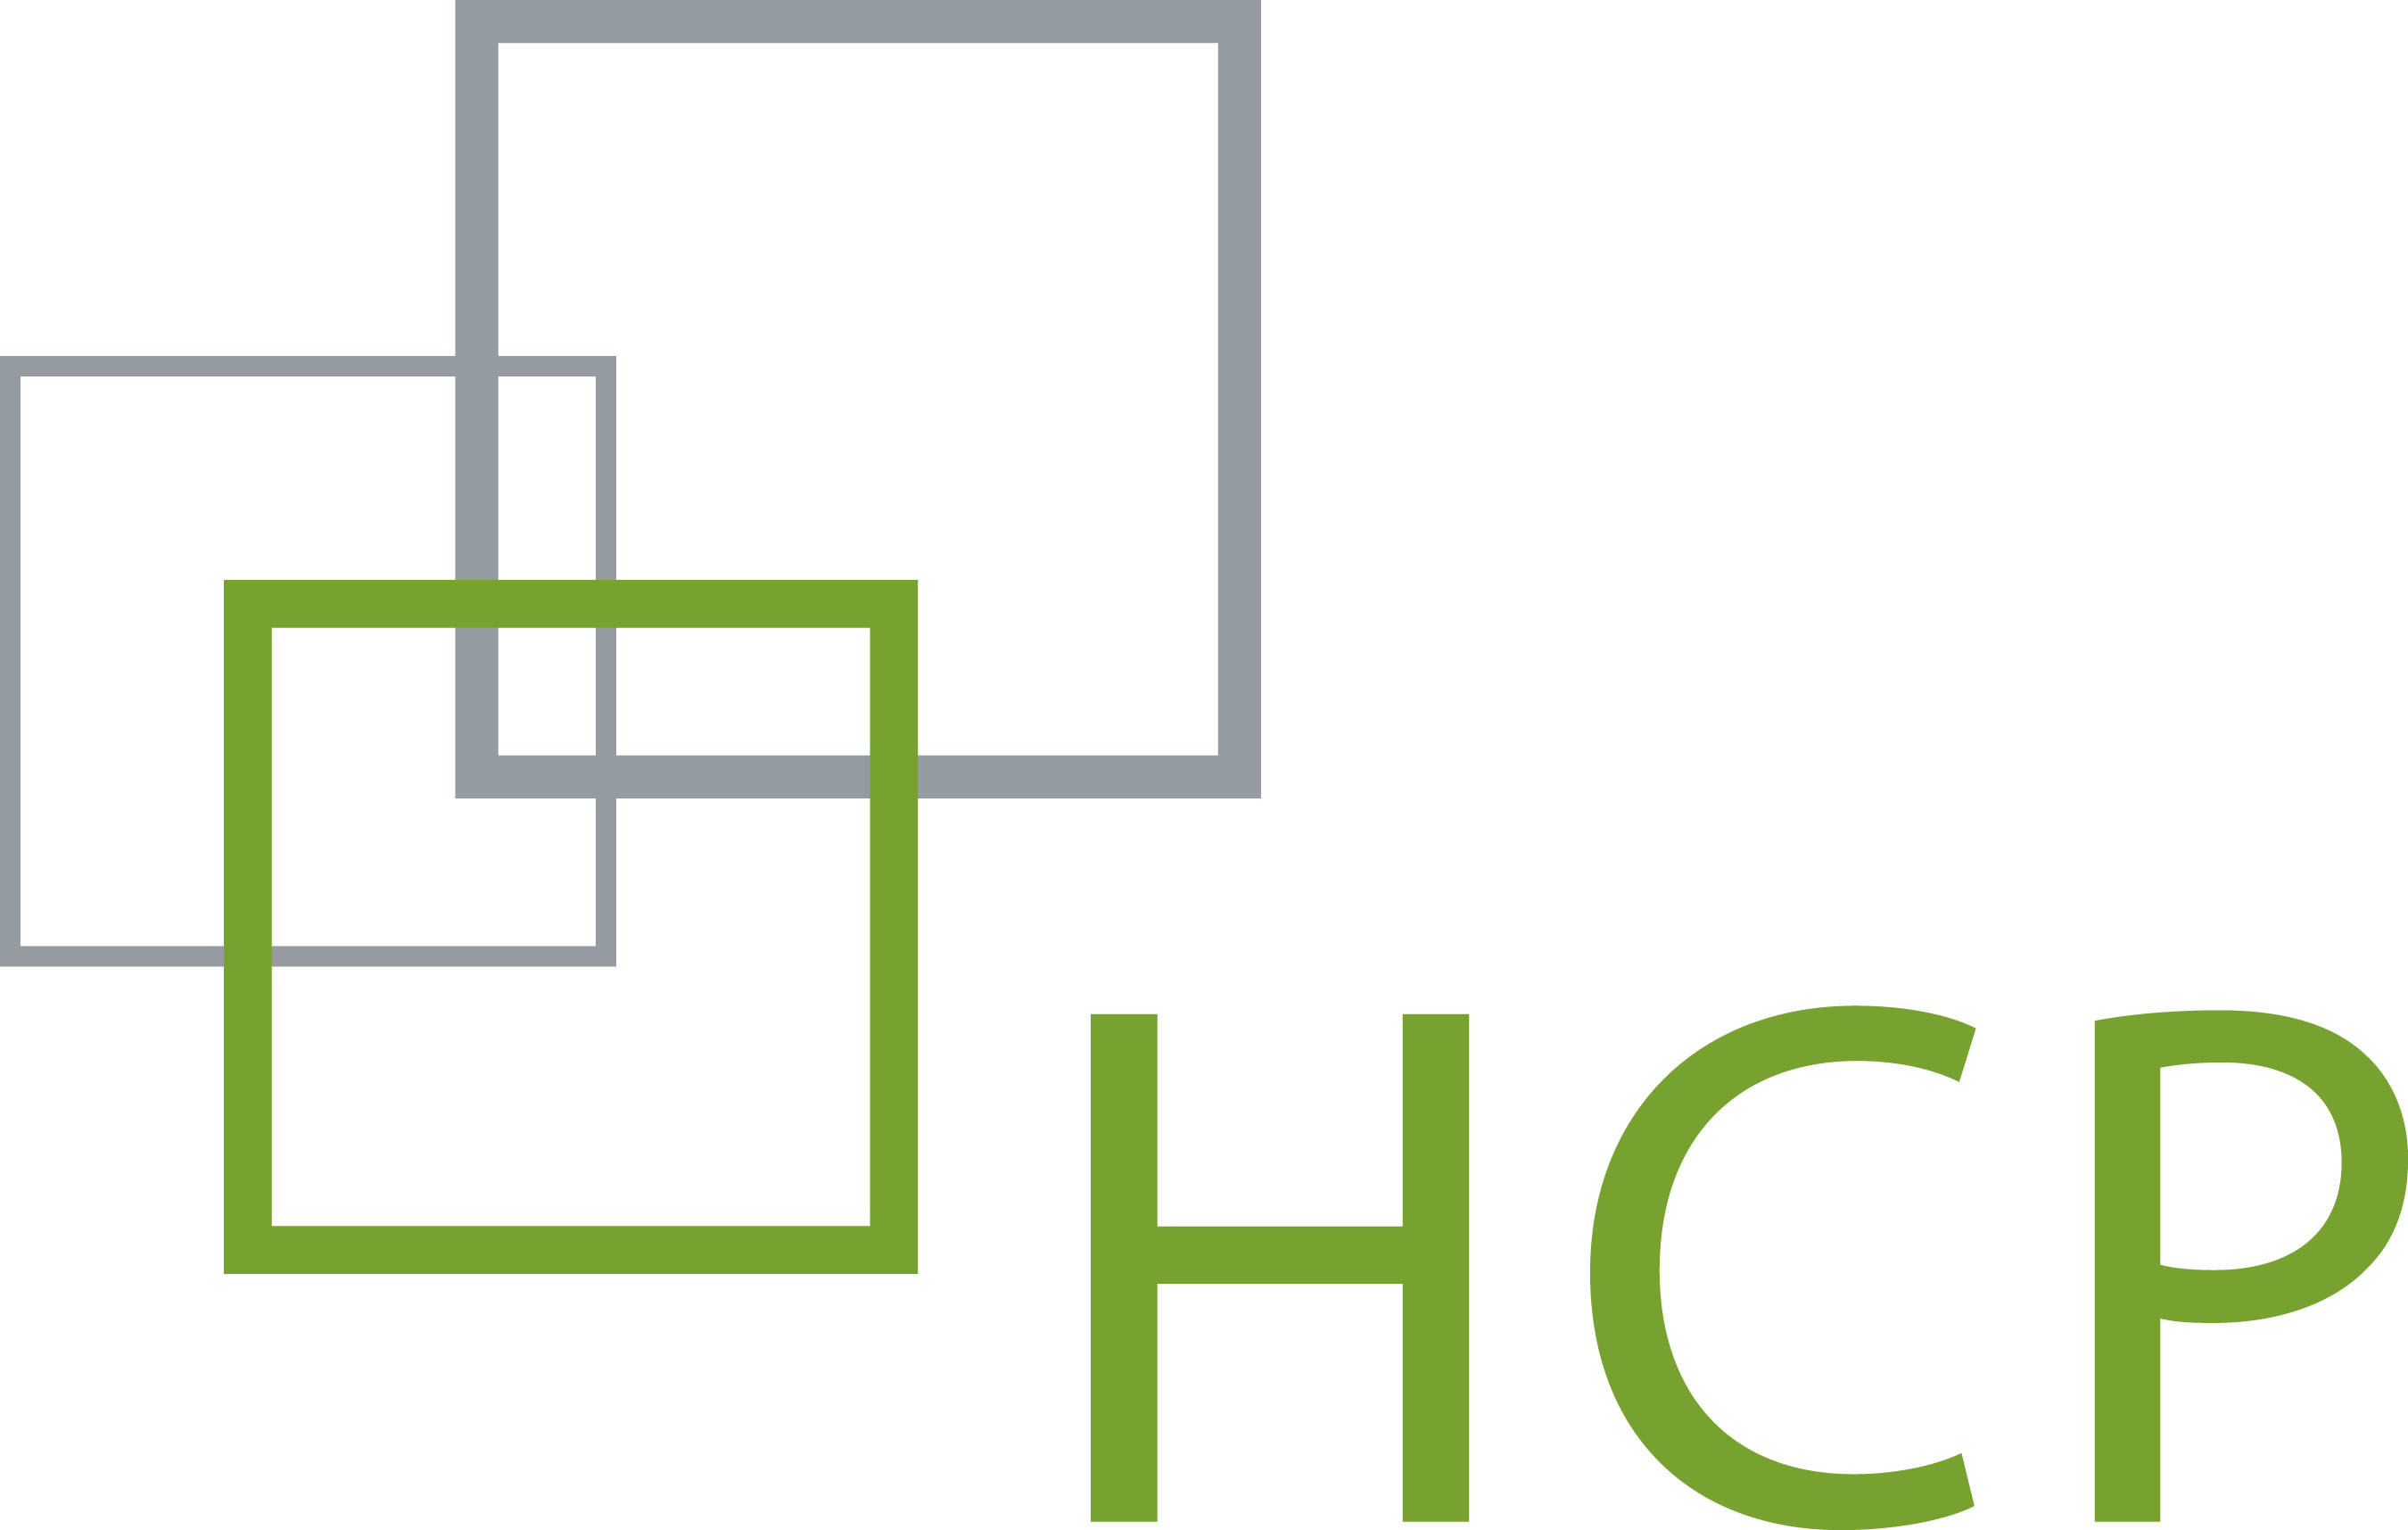 HCP, Inc. Logo. Please visit  www.hcpi.com for more information. (PRNewsFoto/HCP, Inc.)